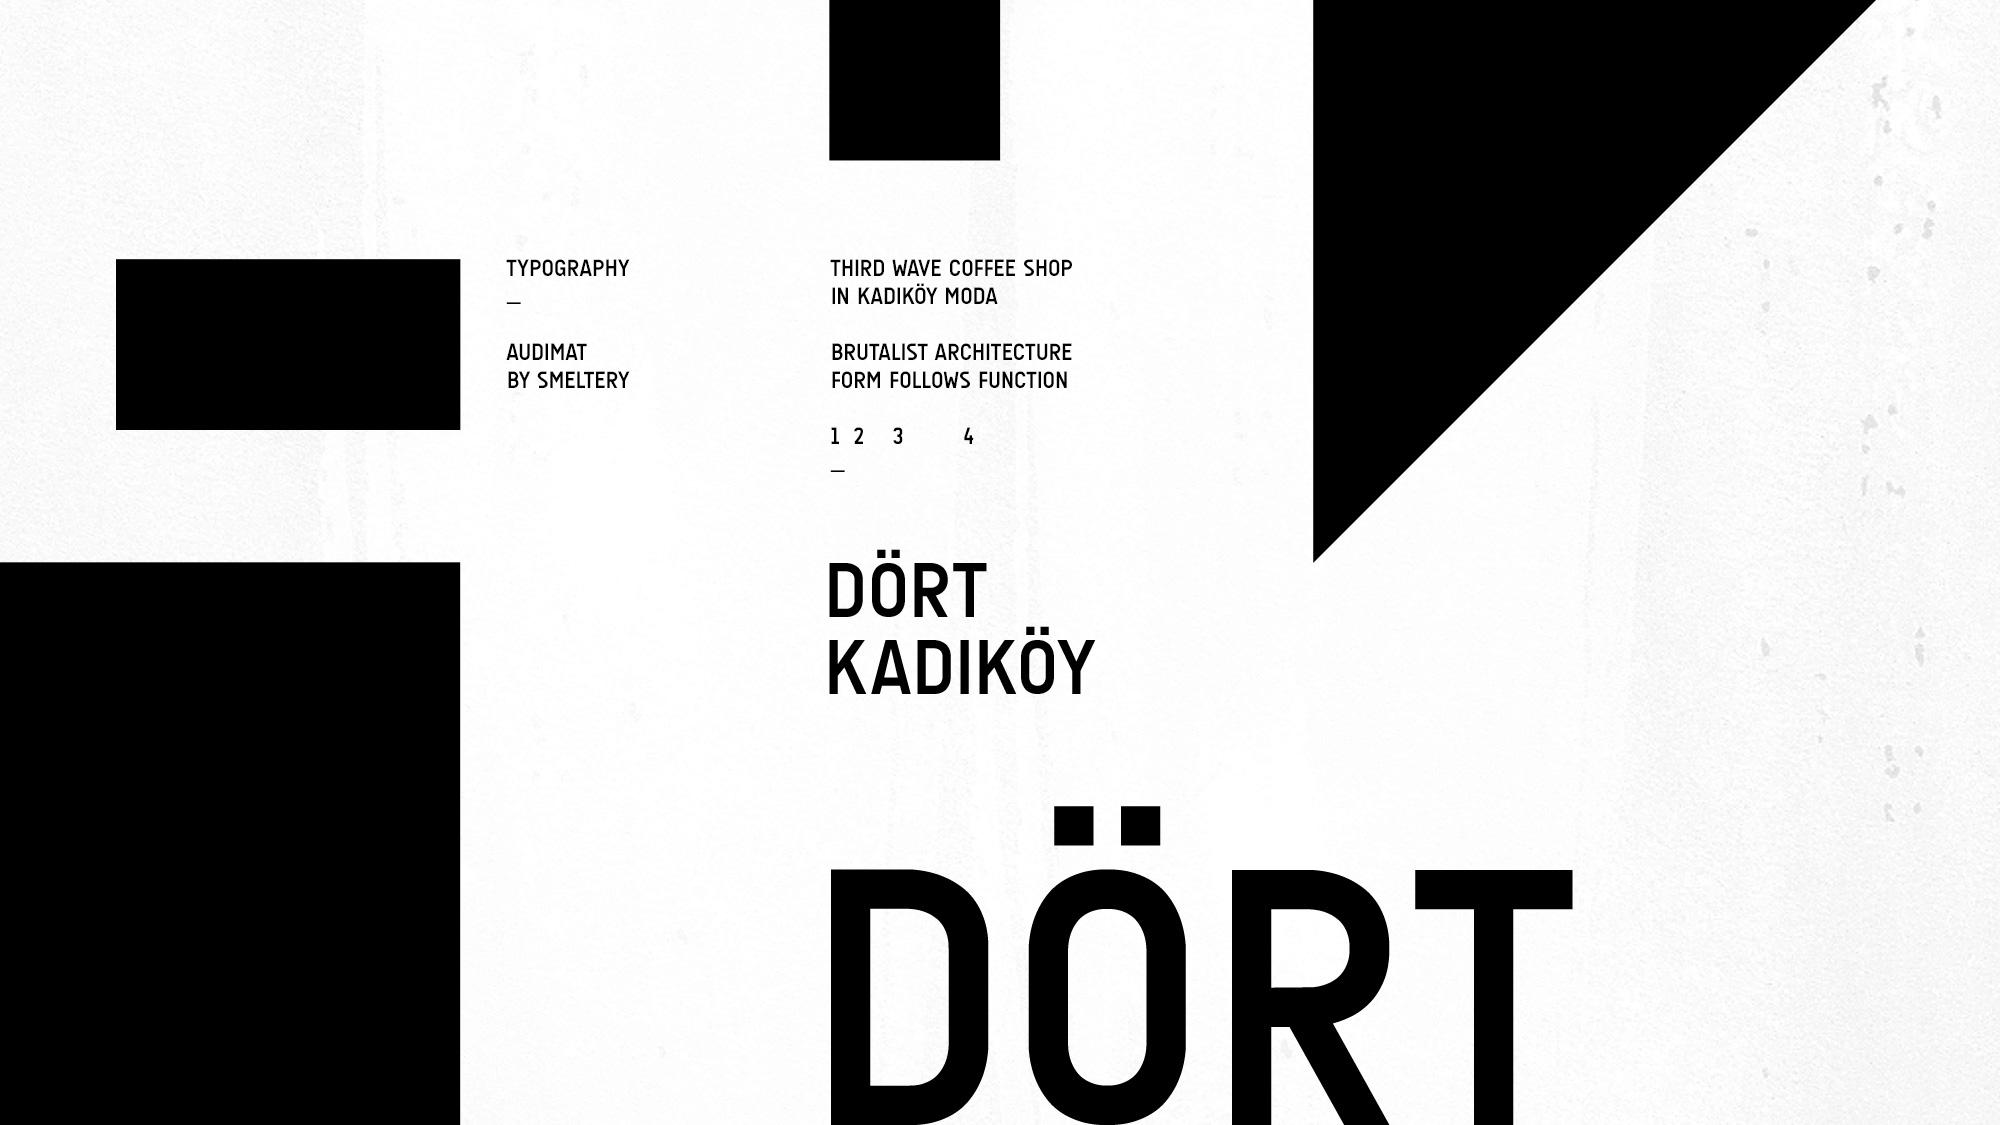 Dortkadikoy_09b